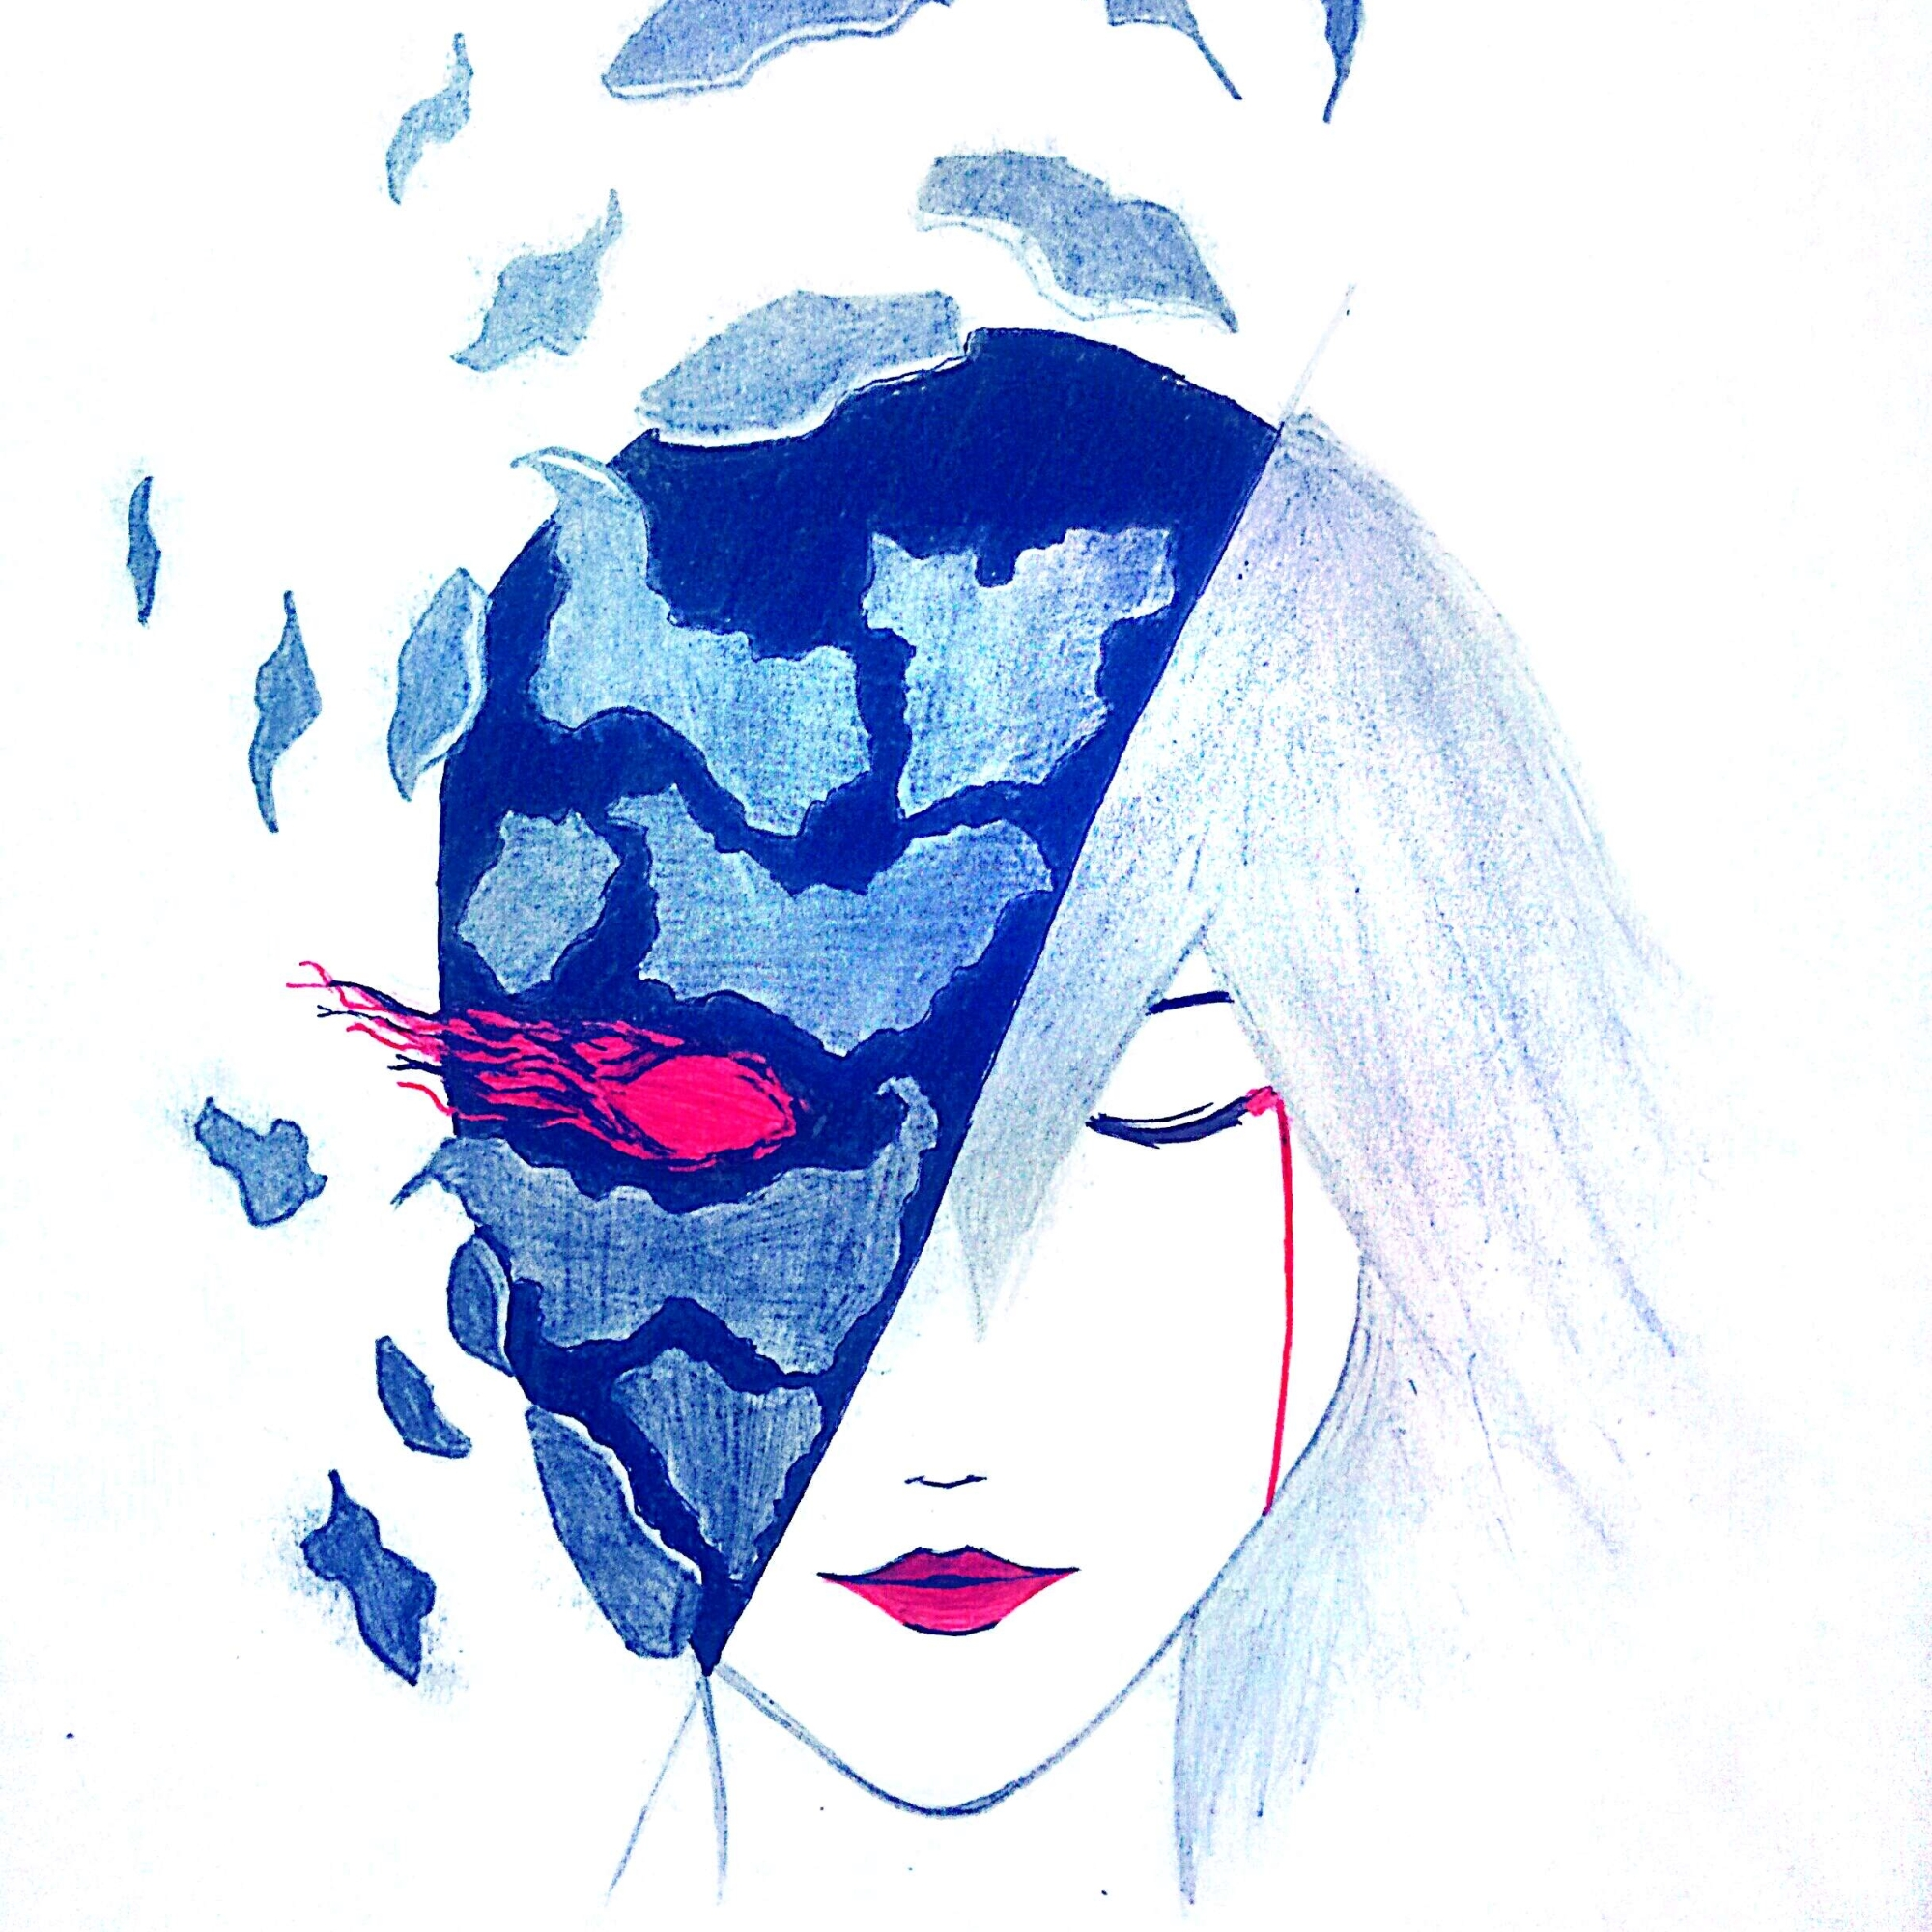 Illustration by Shamanth Joshi